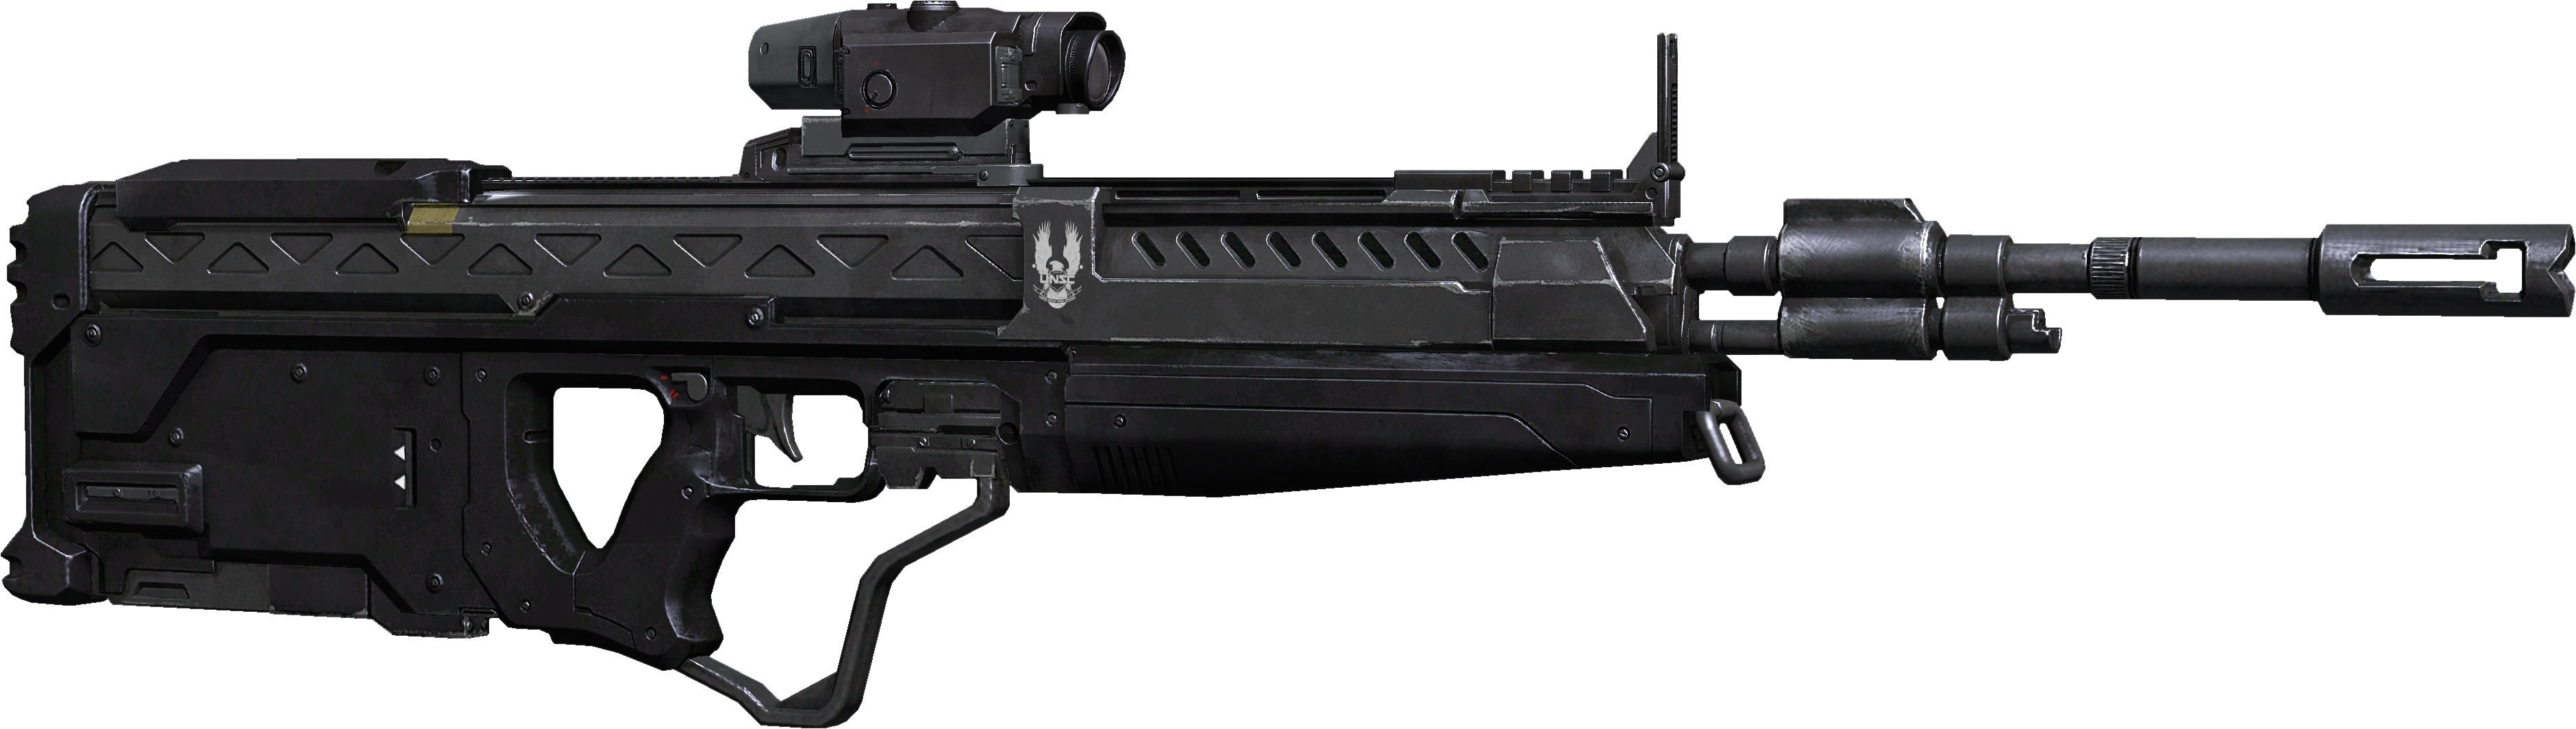 M396 Designated Marksman Rifle